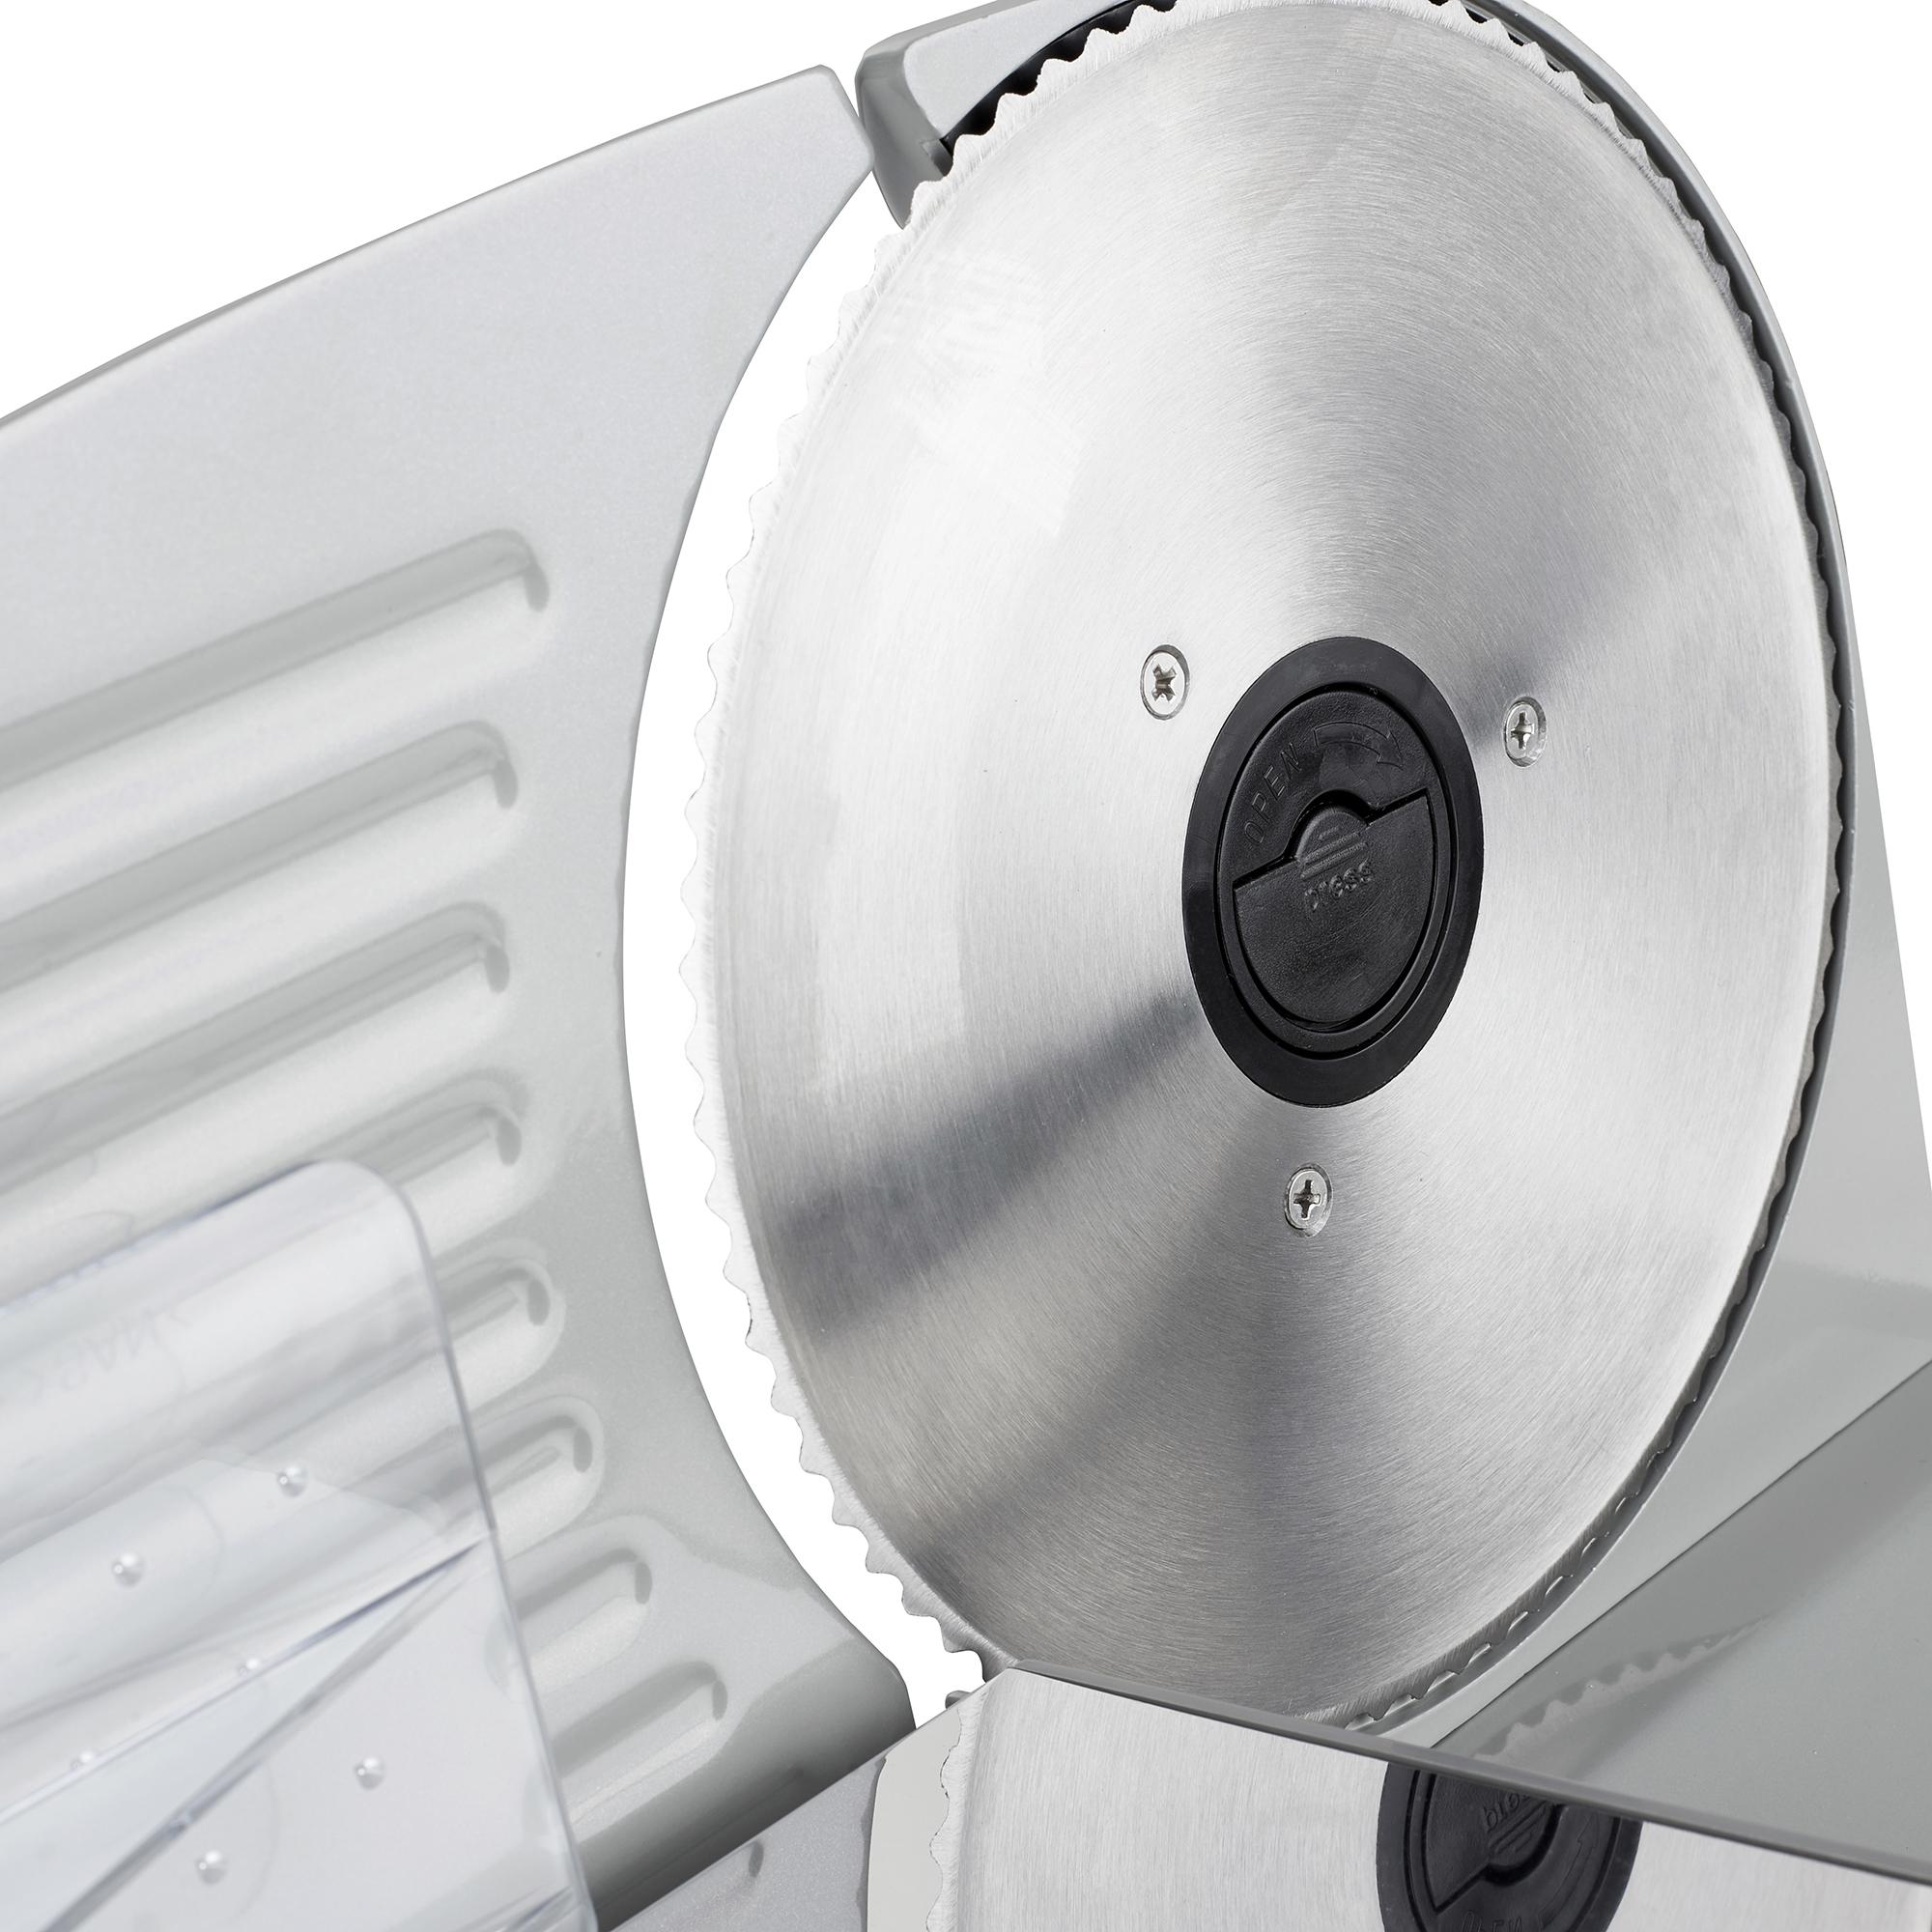 CAMRY CR-4702 Corta fiambres de acero inoxidable semi-profesional, grosor de corte ajustable 15mm, disco corte 19 cm, 150 W